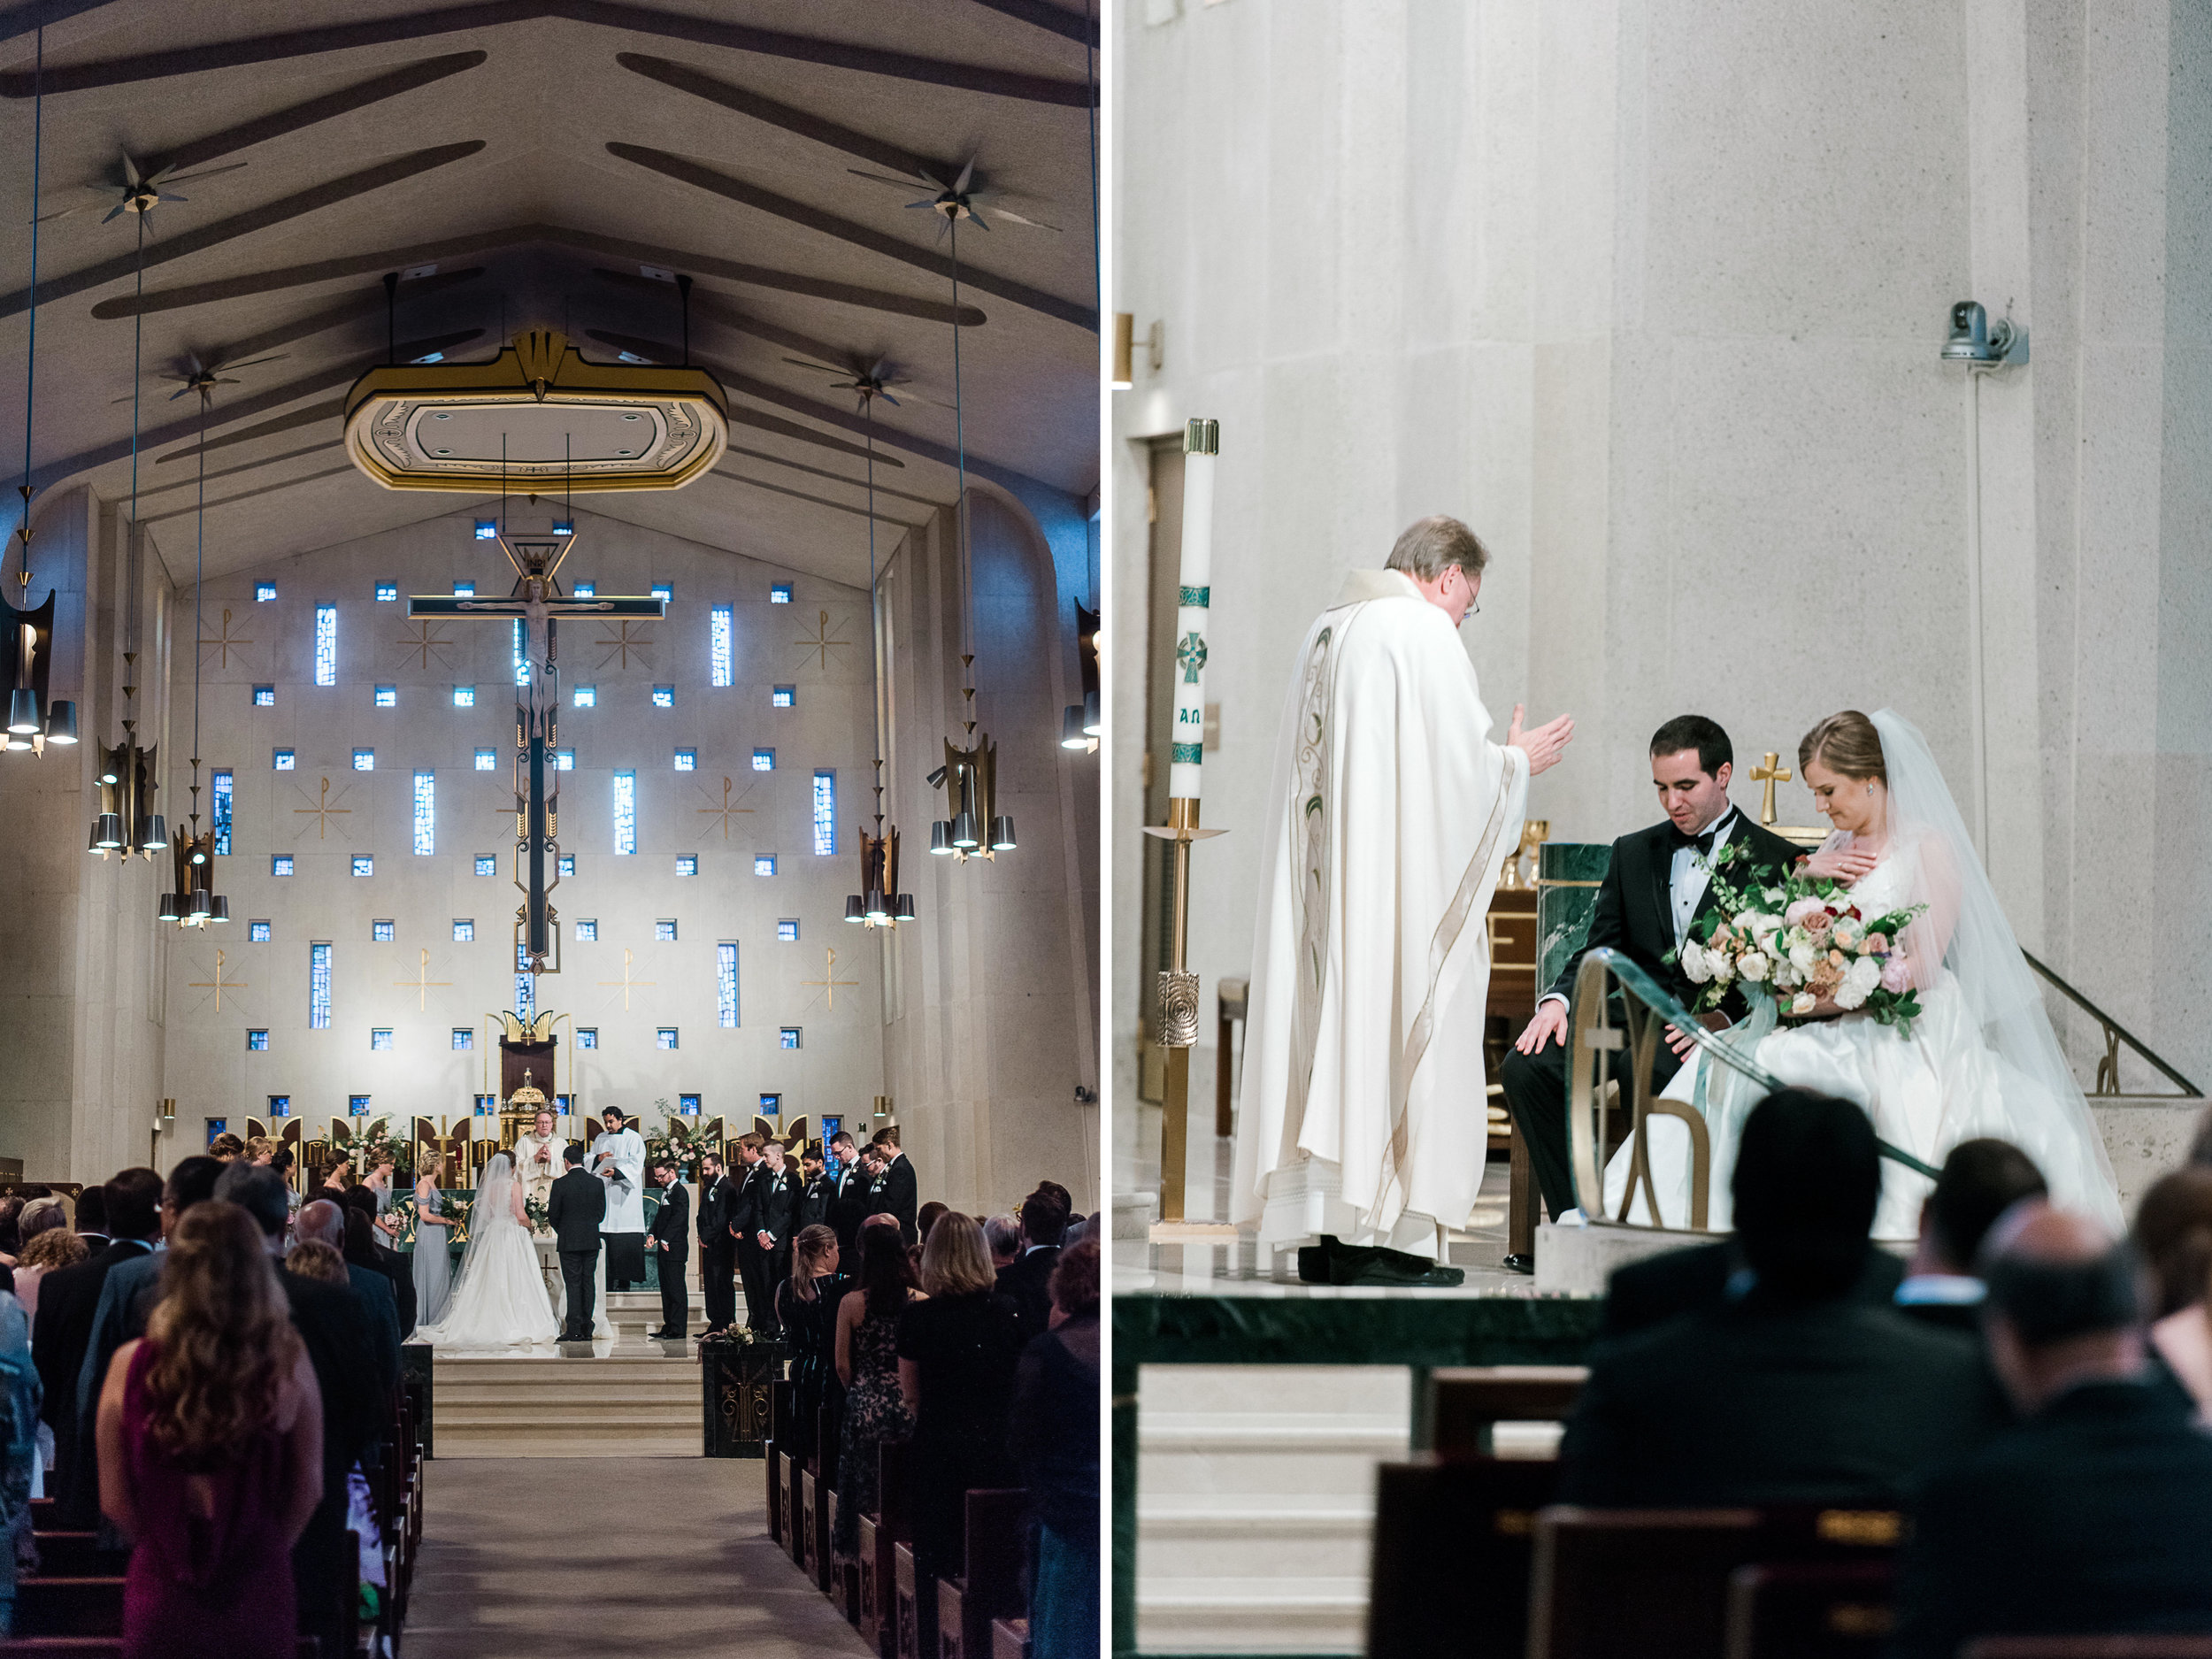 St-Michaels-Catholic-Church-Houston-Wedding-Ceremony-Josh-Dana-Fernandez-Photographer-Destination-Austin-Dallas-Fine-Art-Film=1-4.jpg